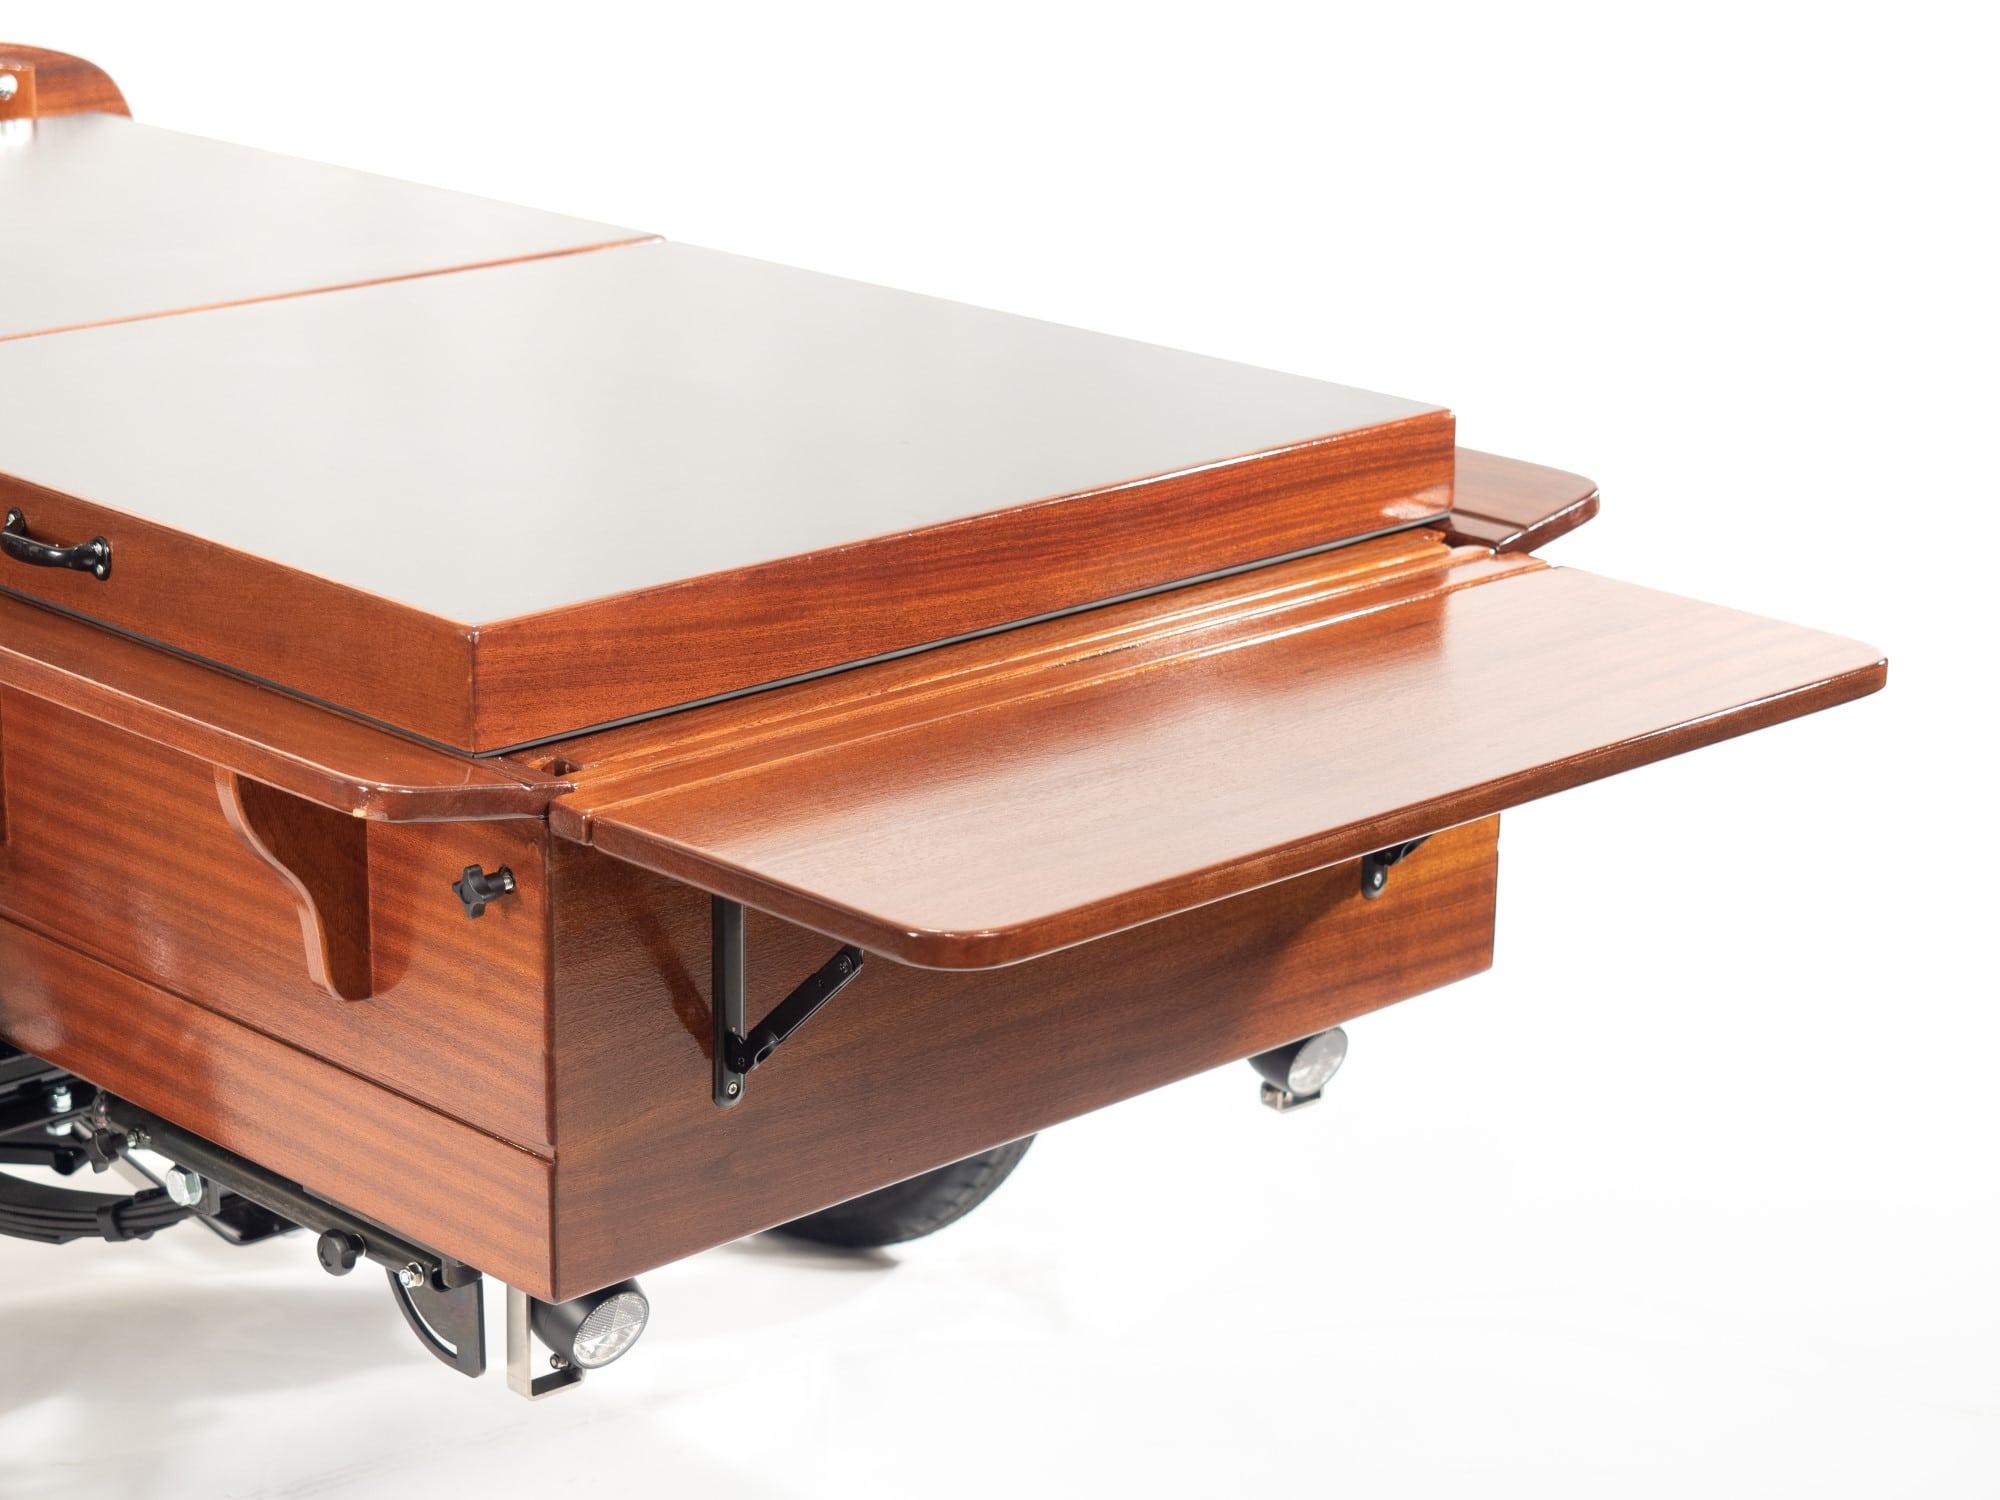 Solid mahogany cargo box on leaf springs